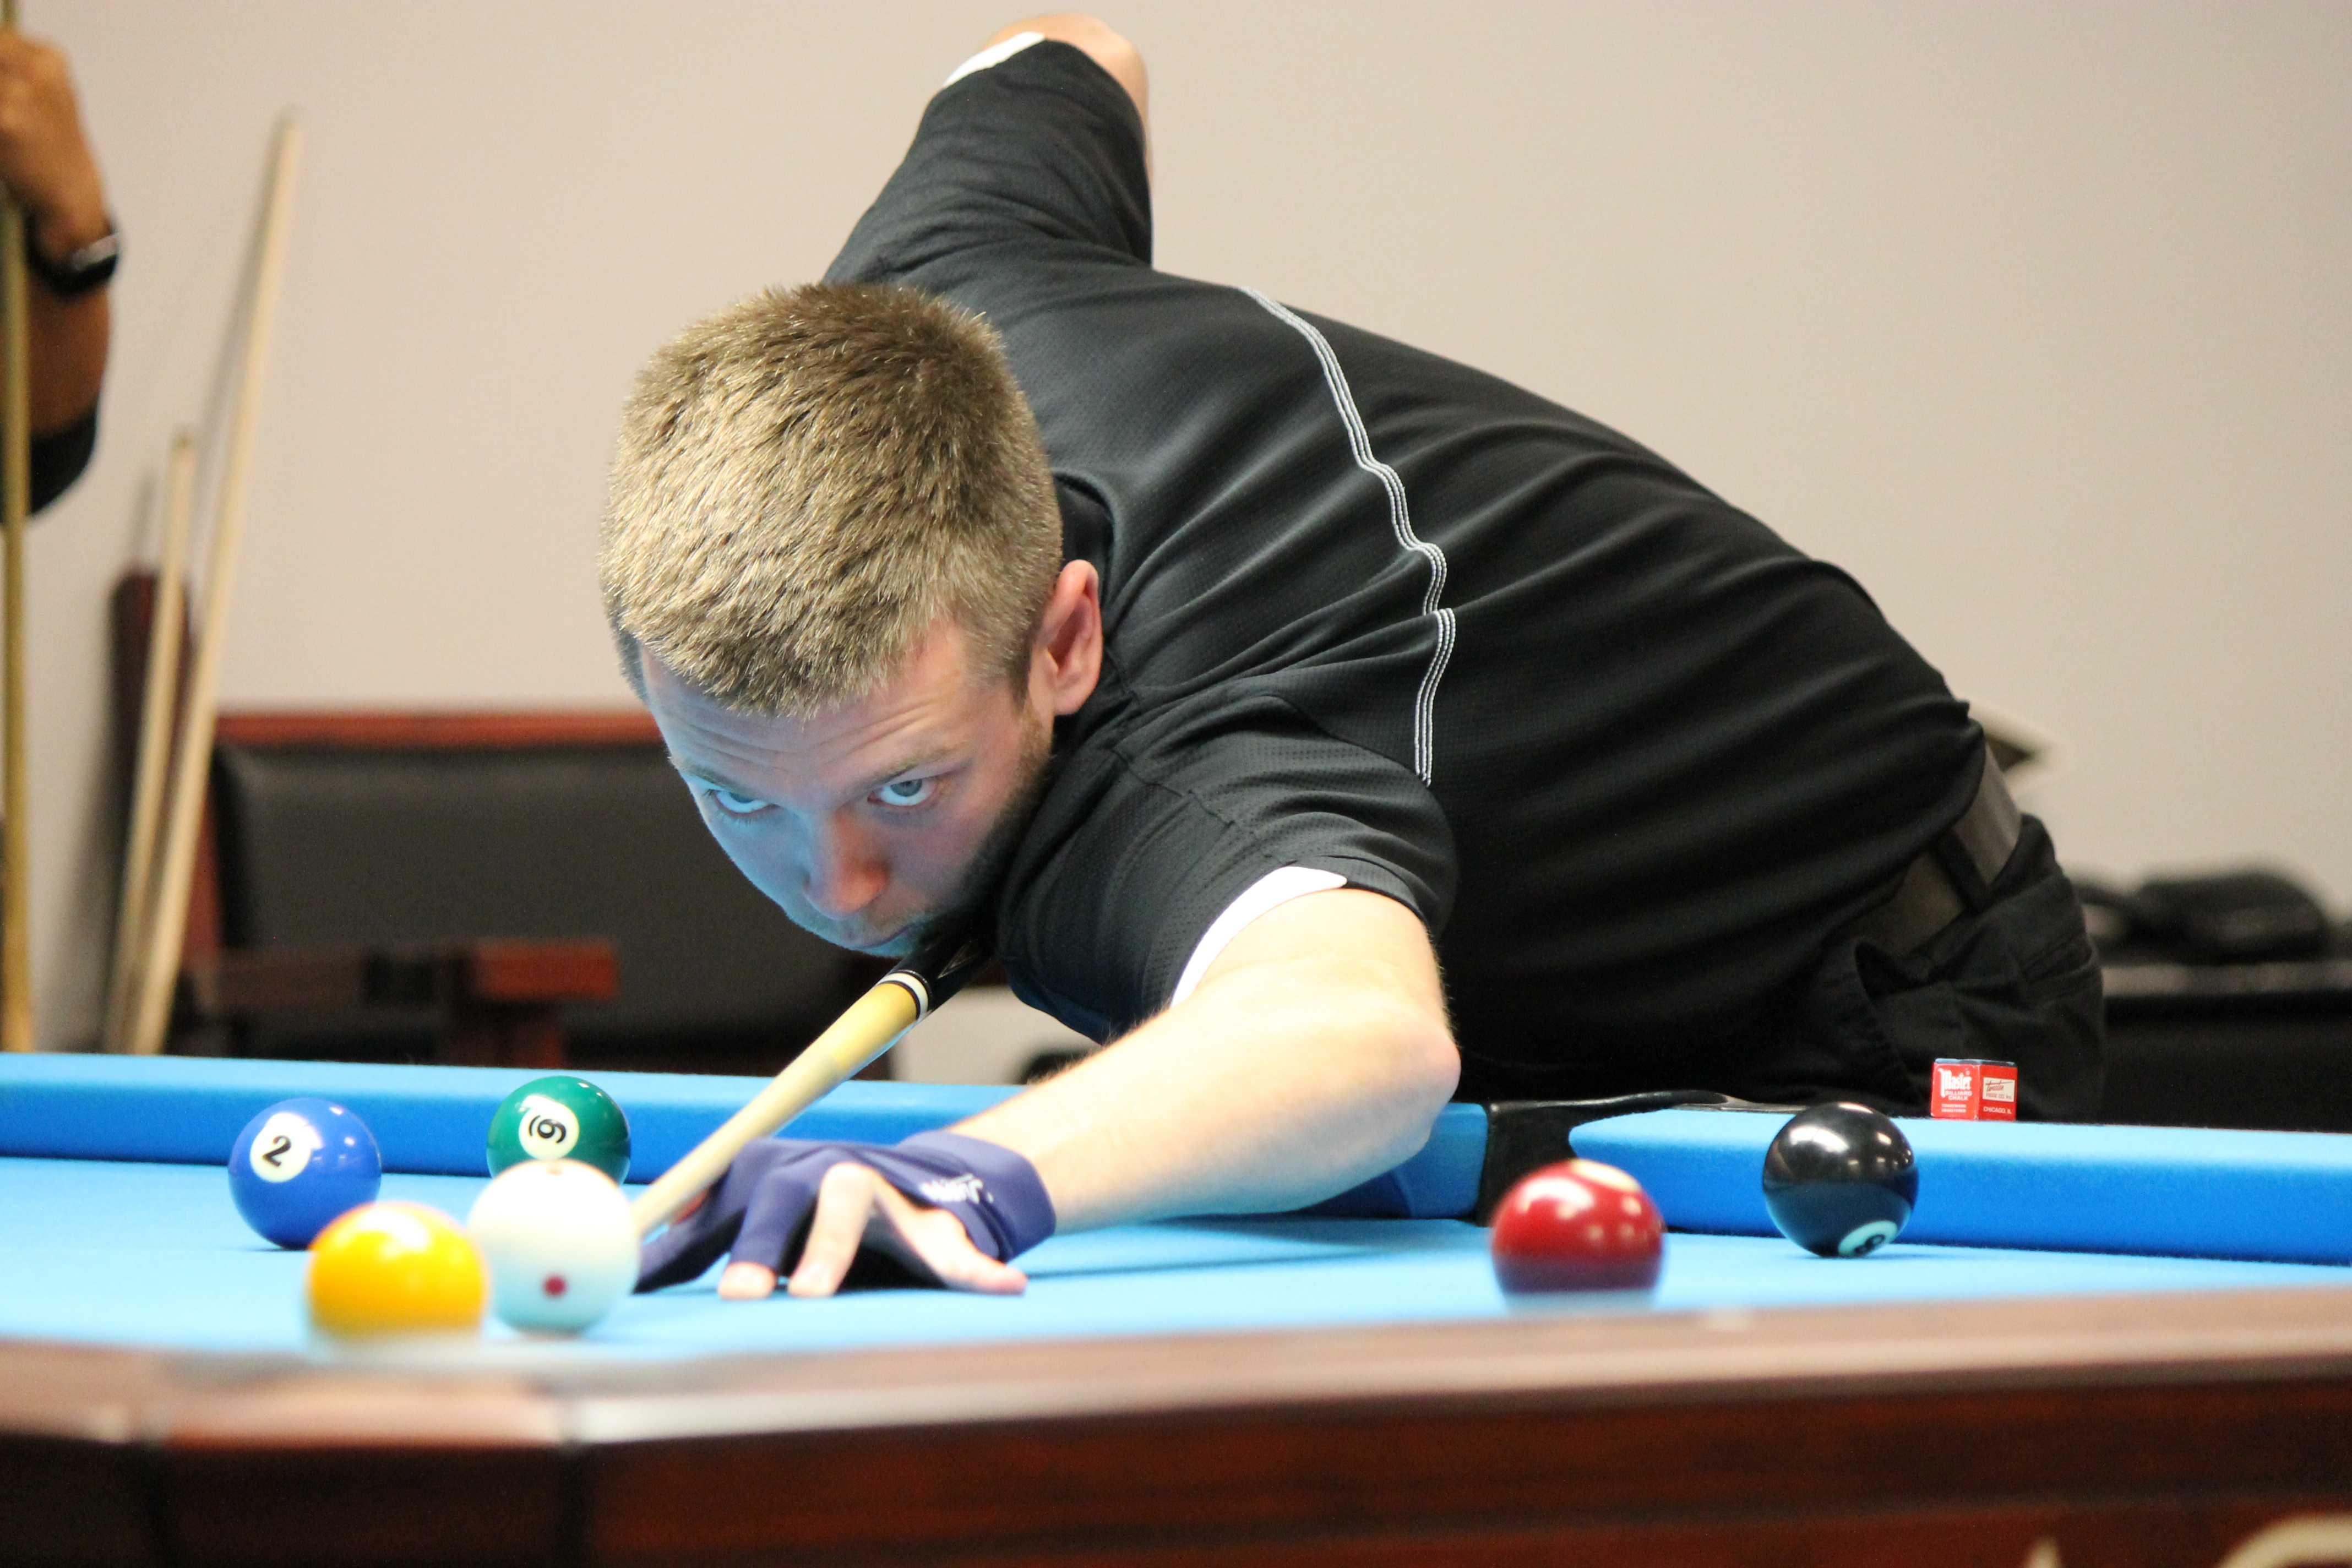 Lindenwood billiards player Landon Shuffet